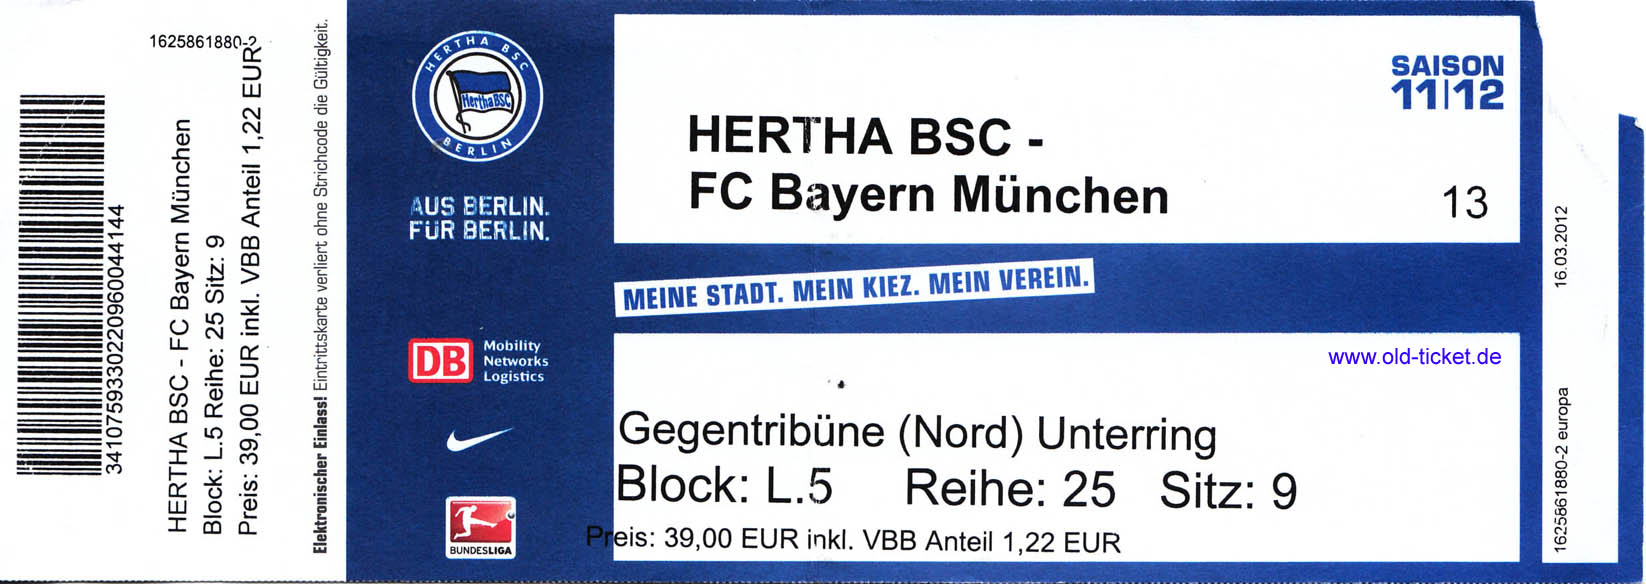 hoffenheim hertha tickets